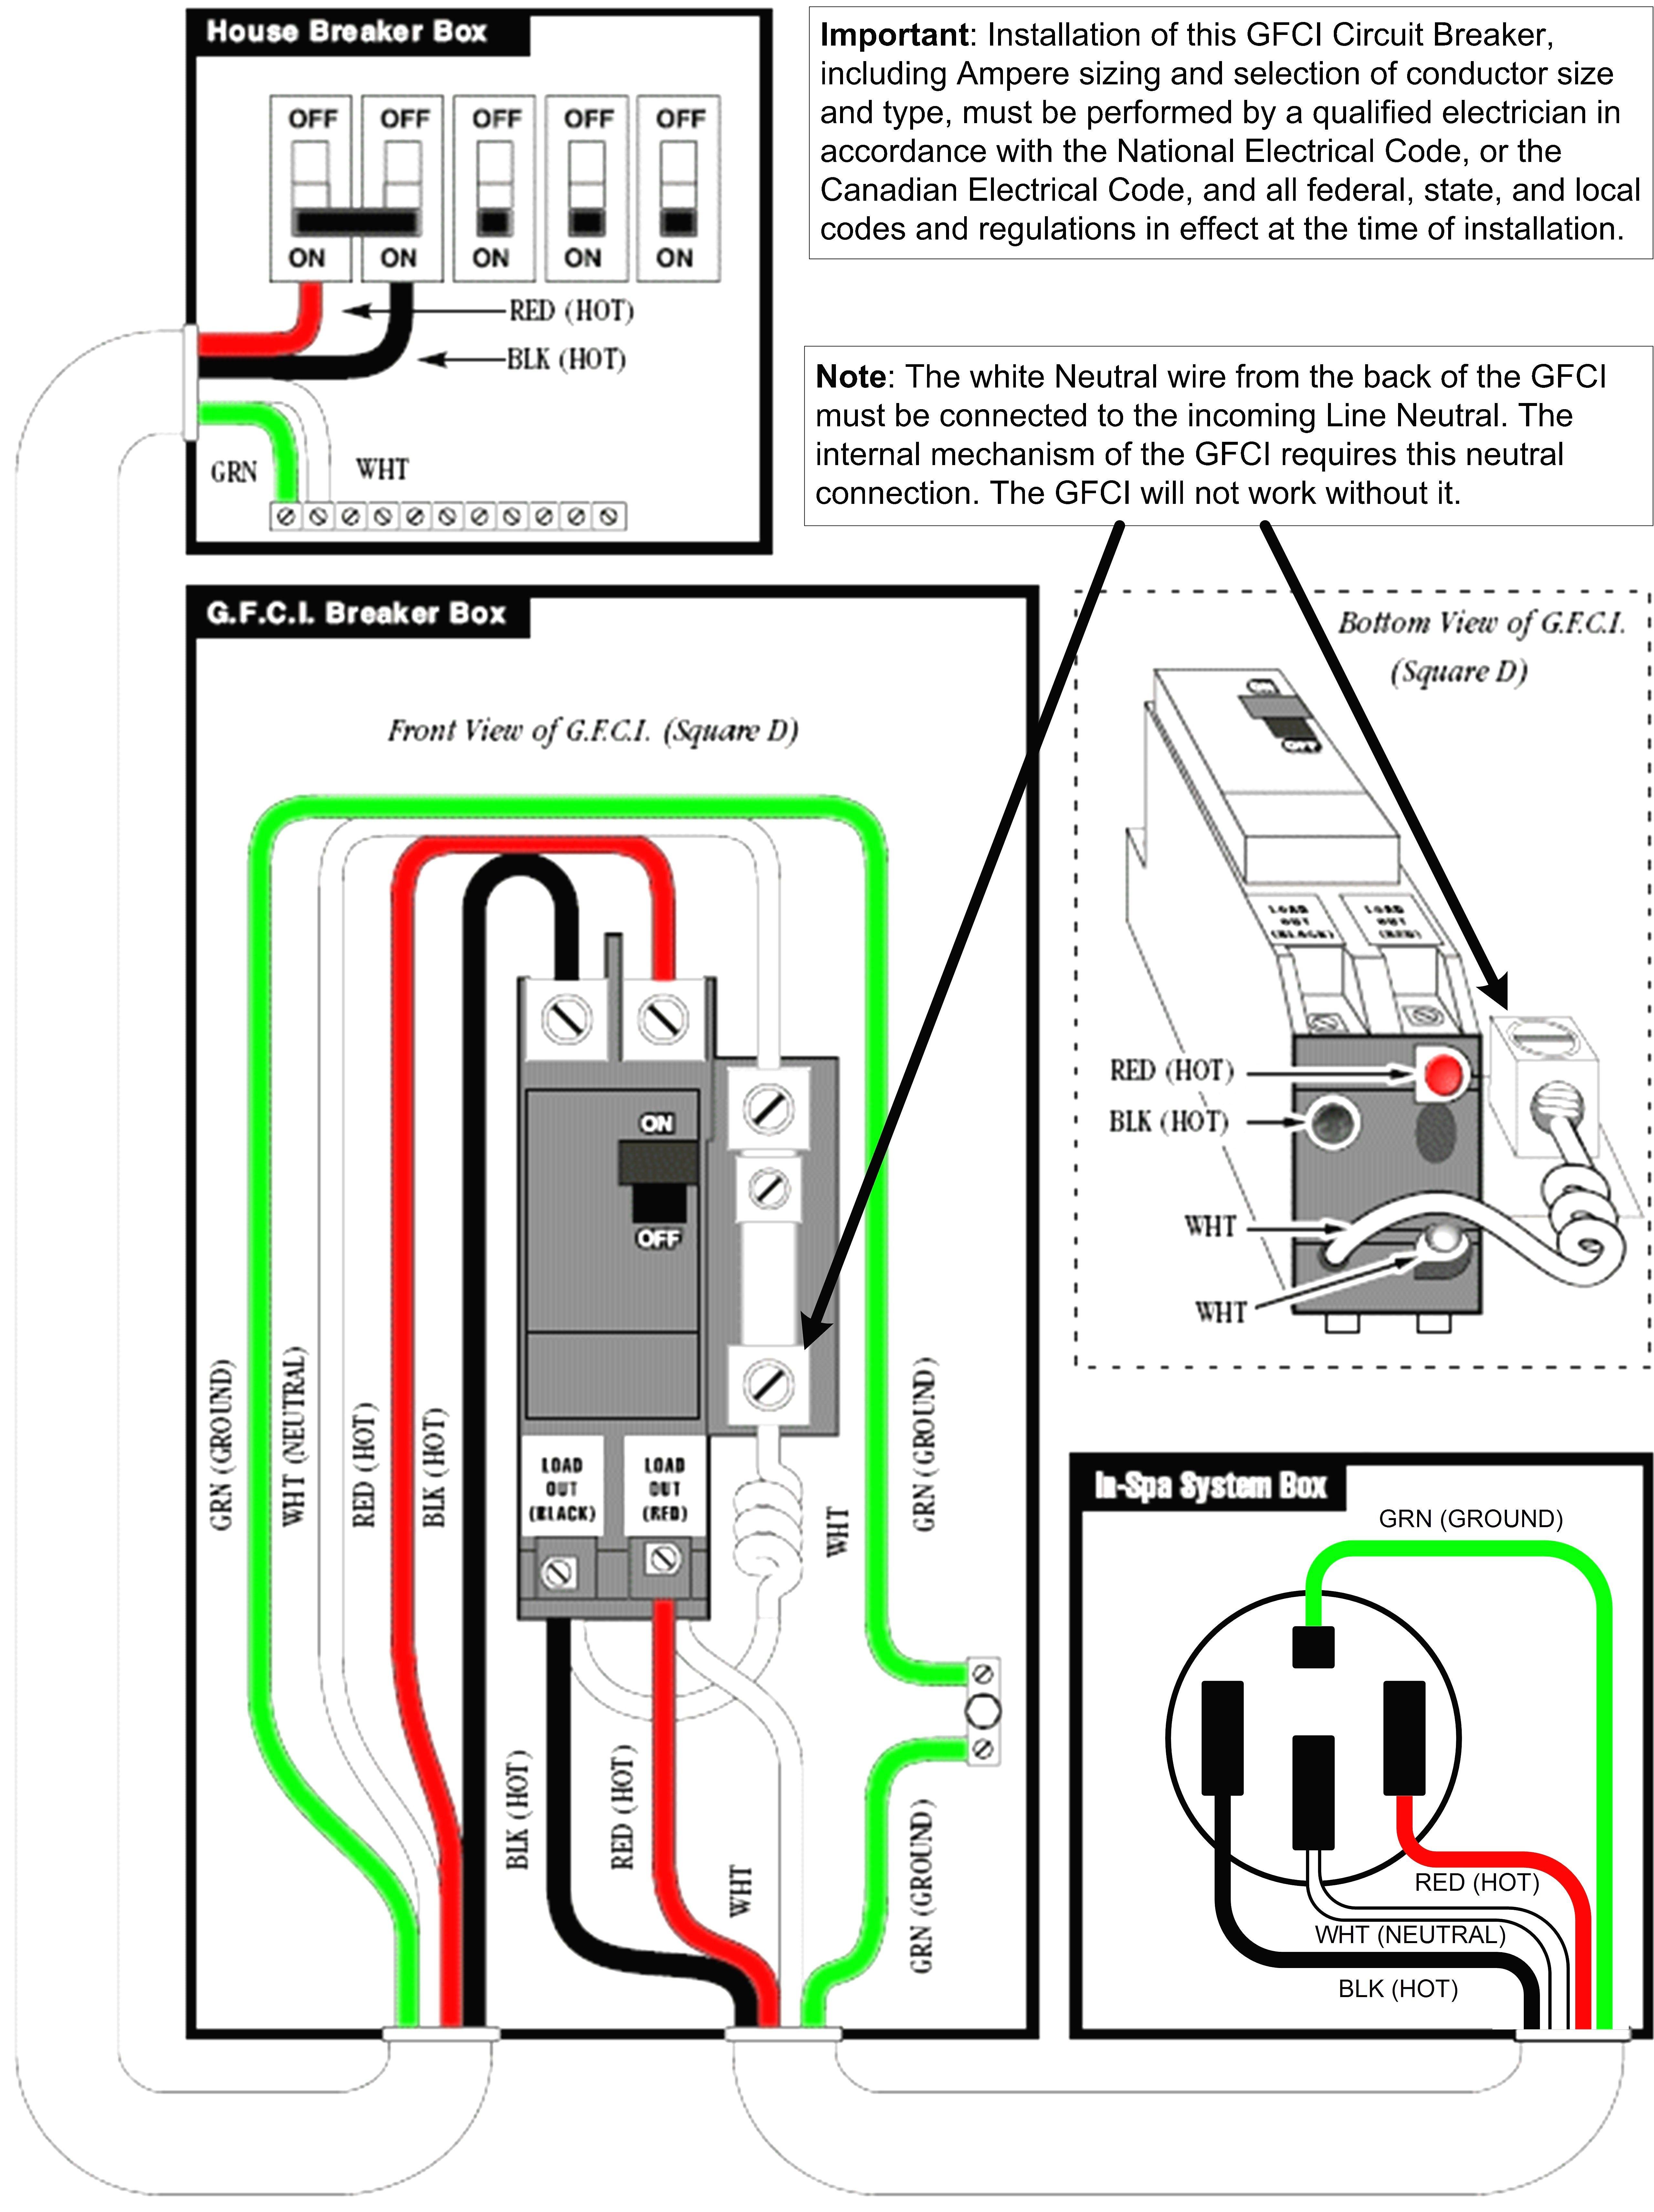 hight resolution of new gfci wiring diagram for hot tub diagram diagramsample diagramtemplate wiringdiagram